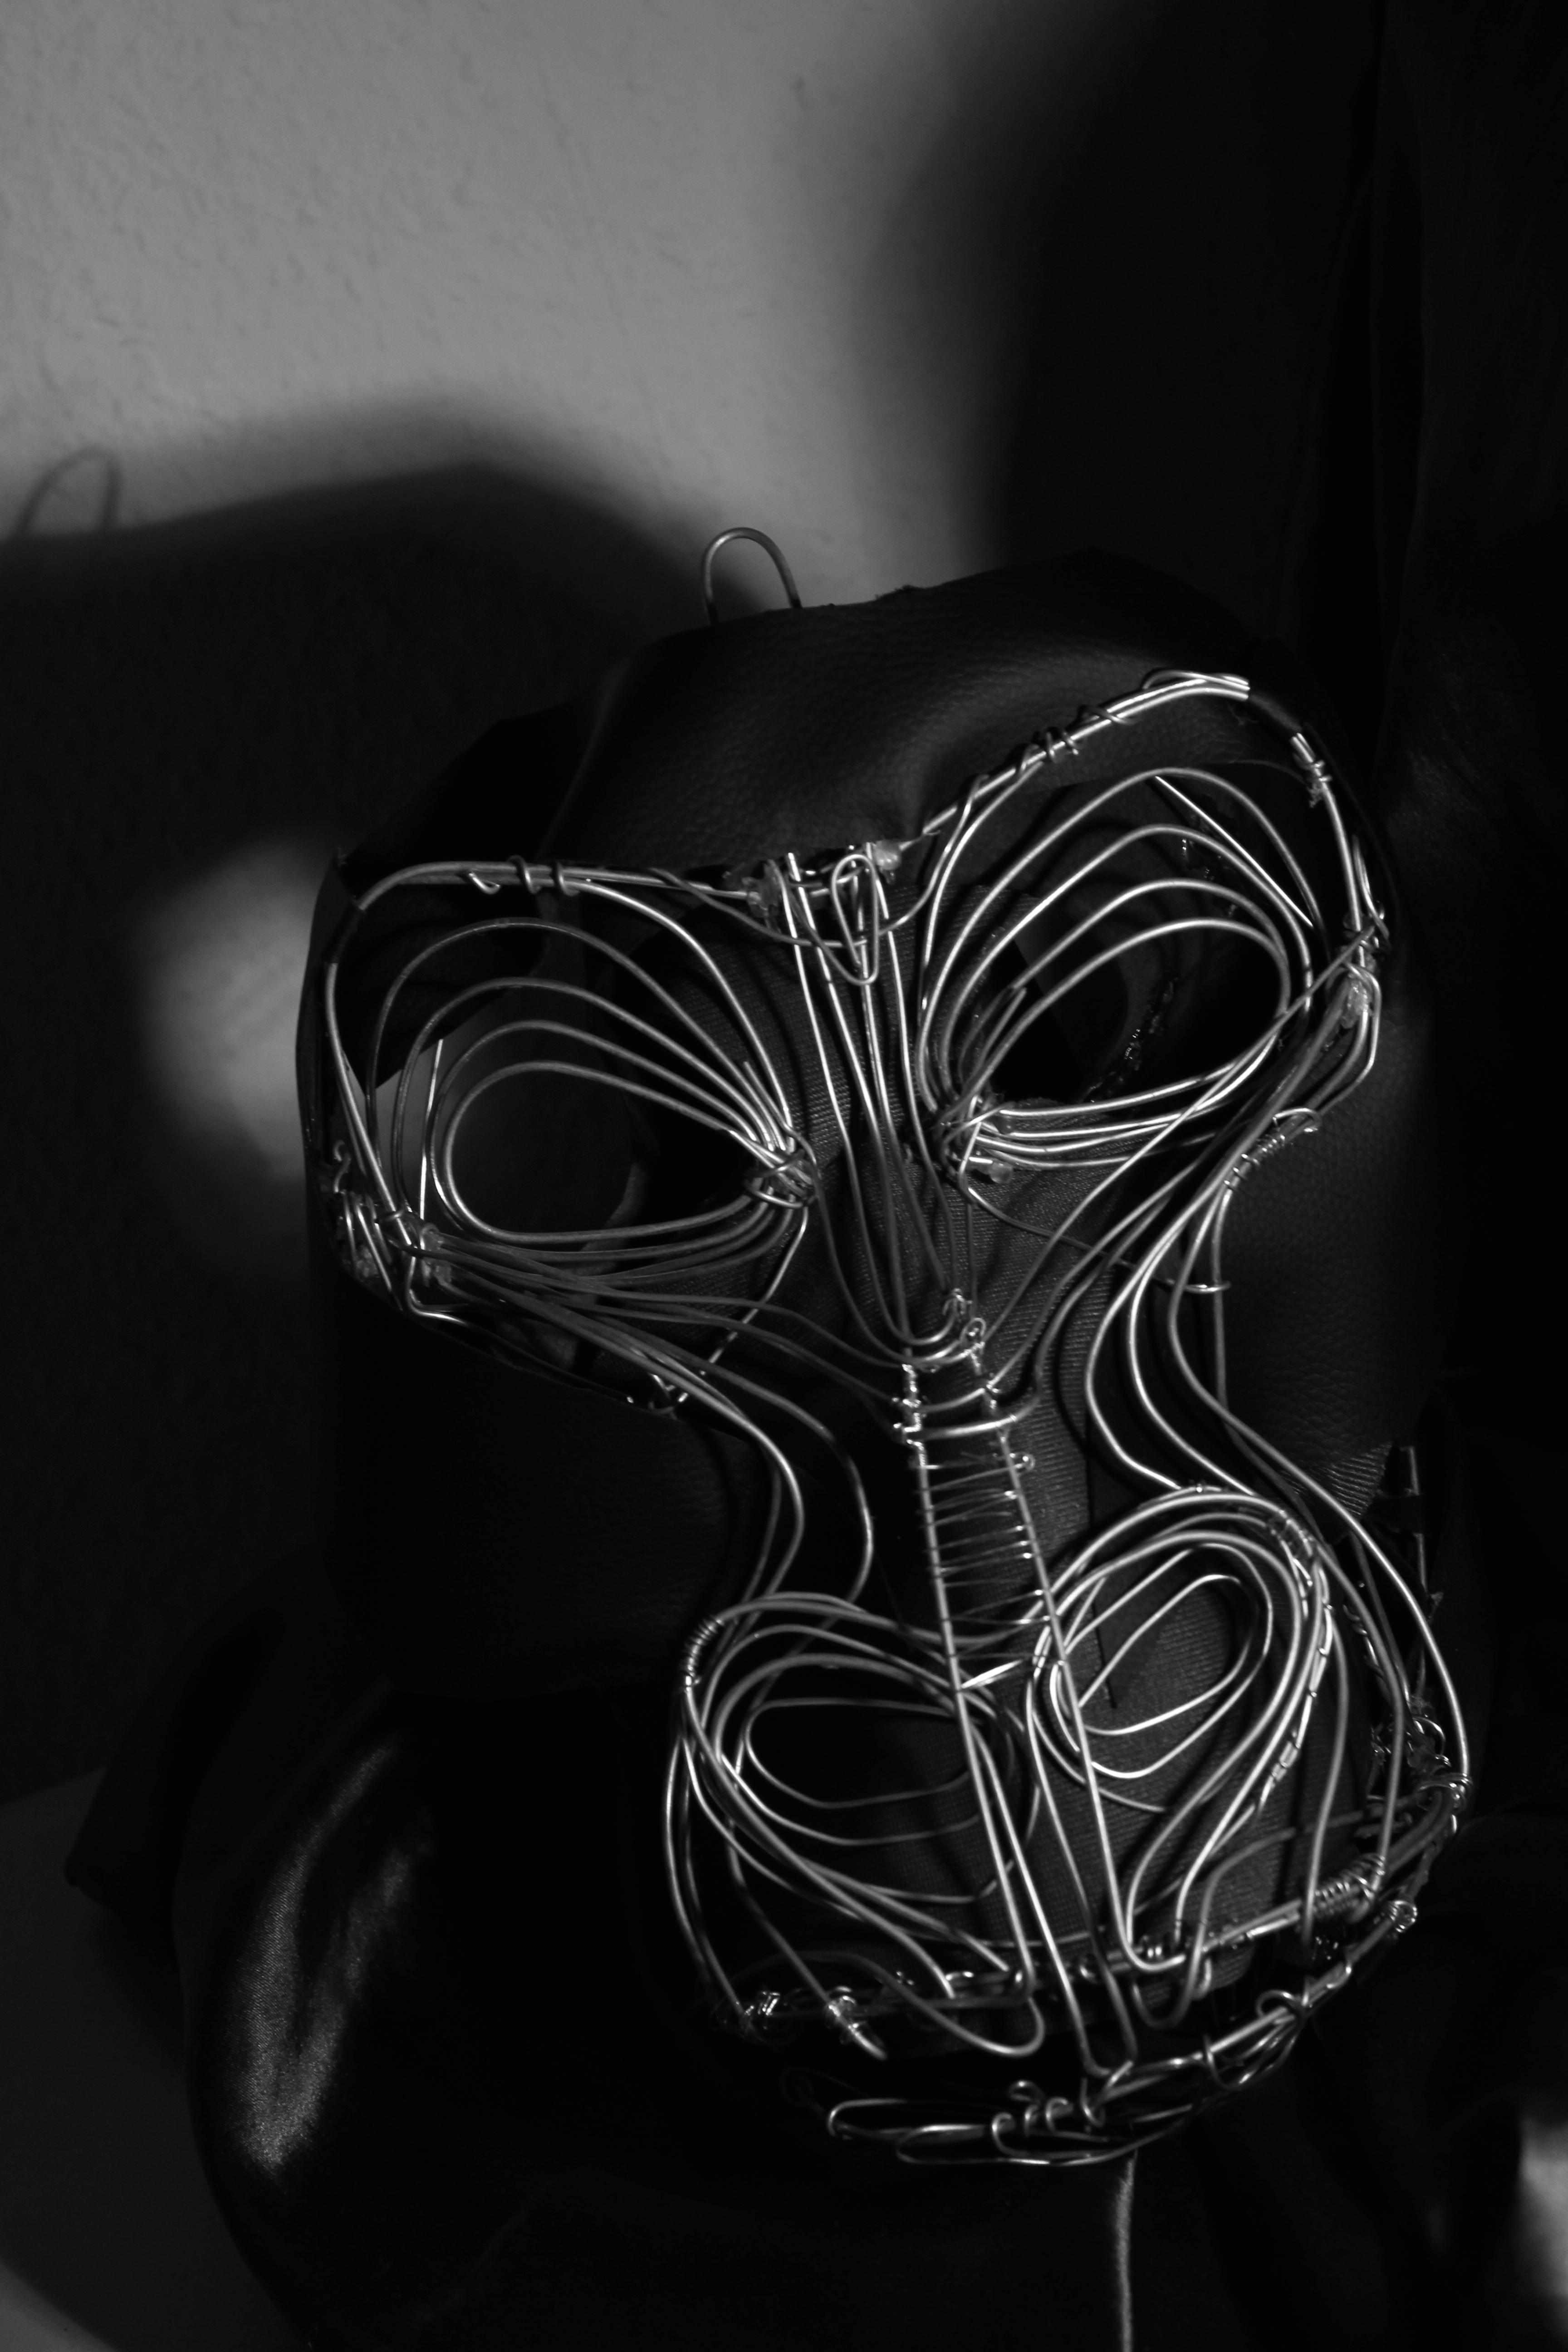 Gorilla mask 1 - Liz Kosack